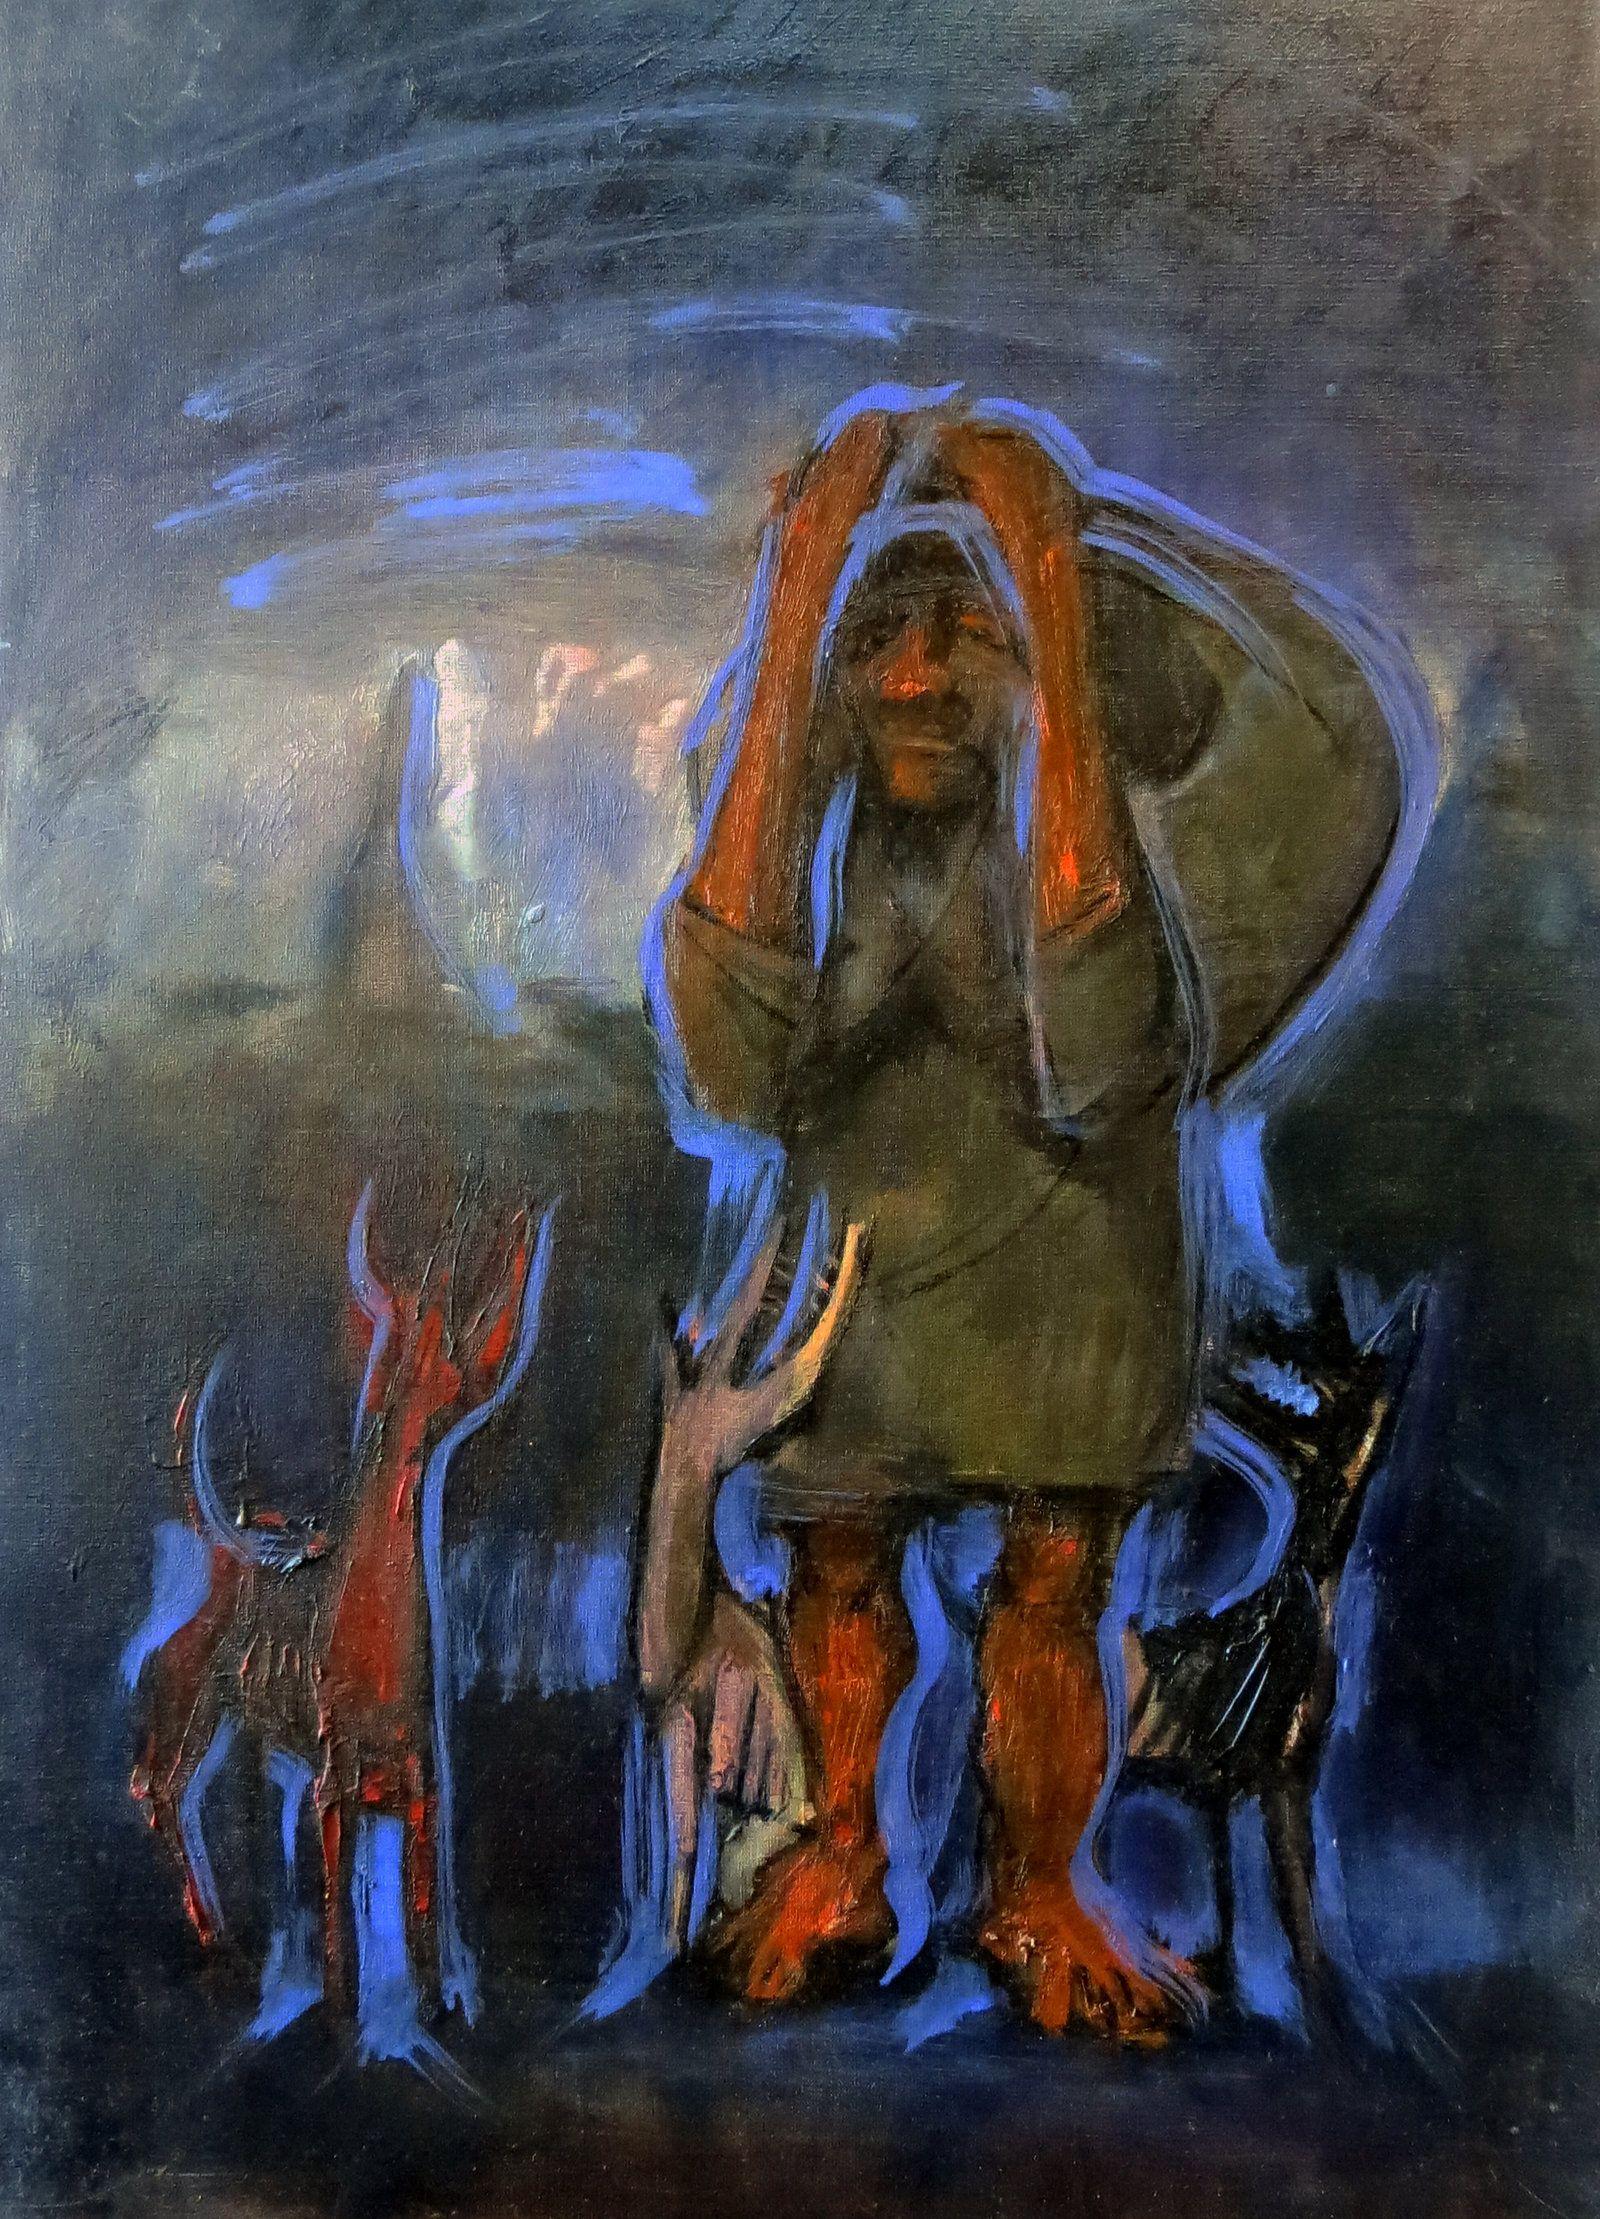 """La carga"" / #Chaco ""Burden"" / #Chaco #Oleo / 50 x 70 cm / 1984"